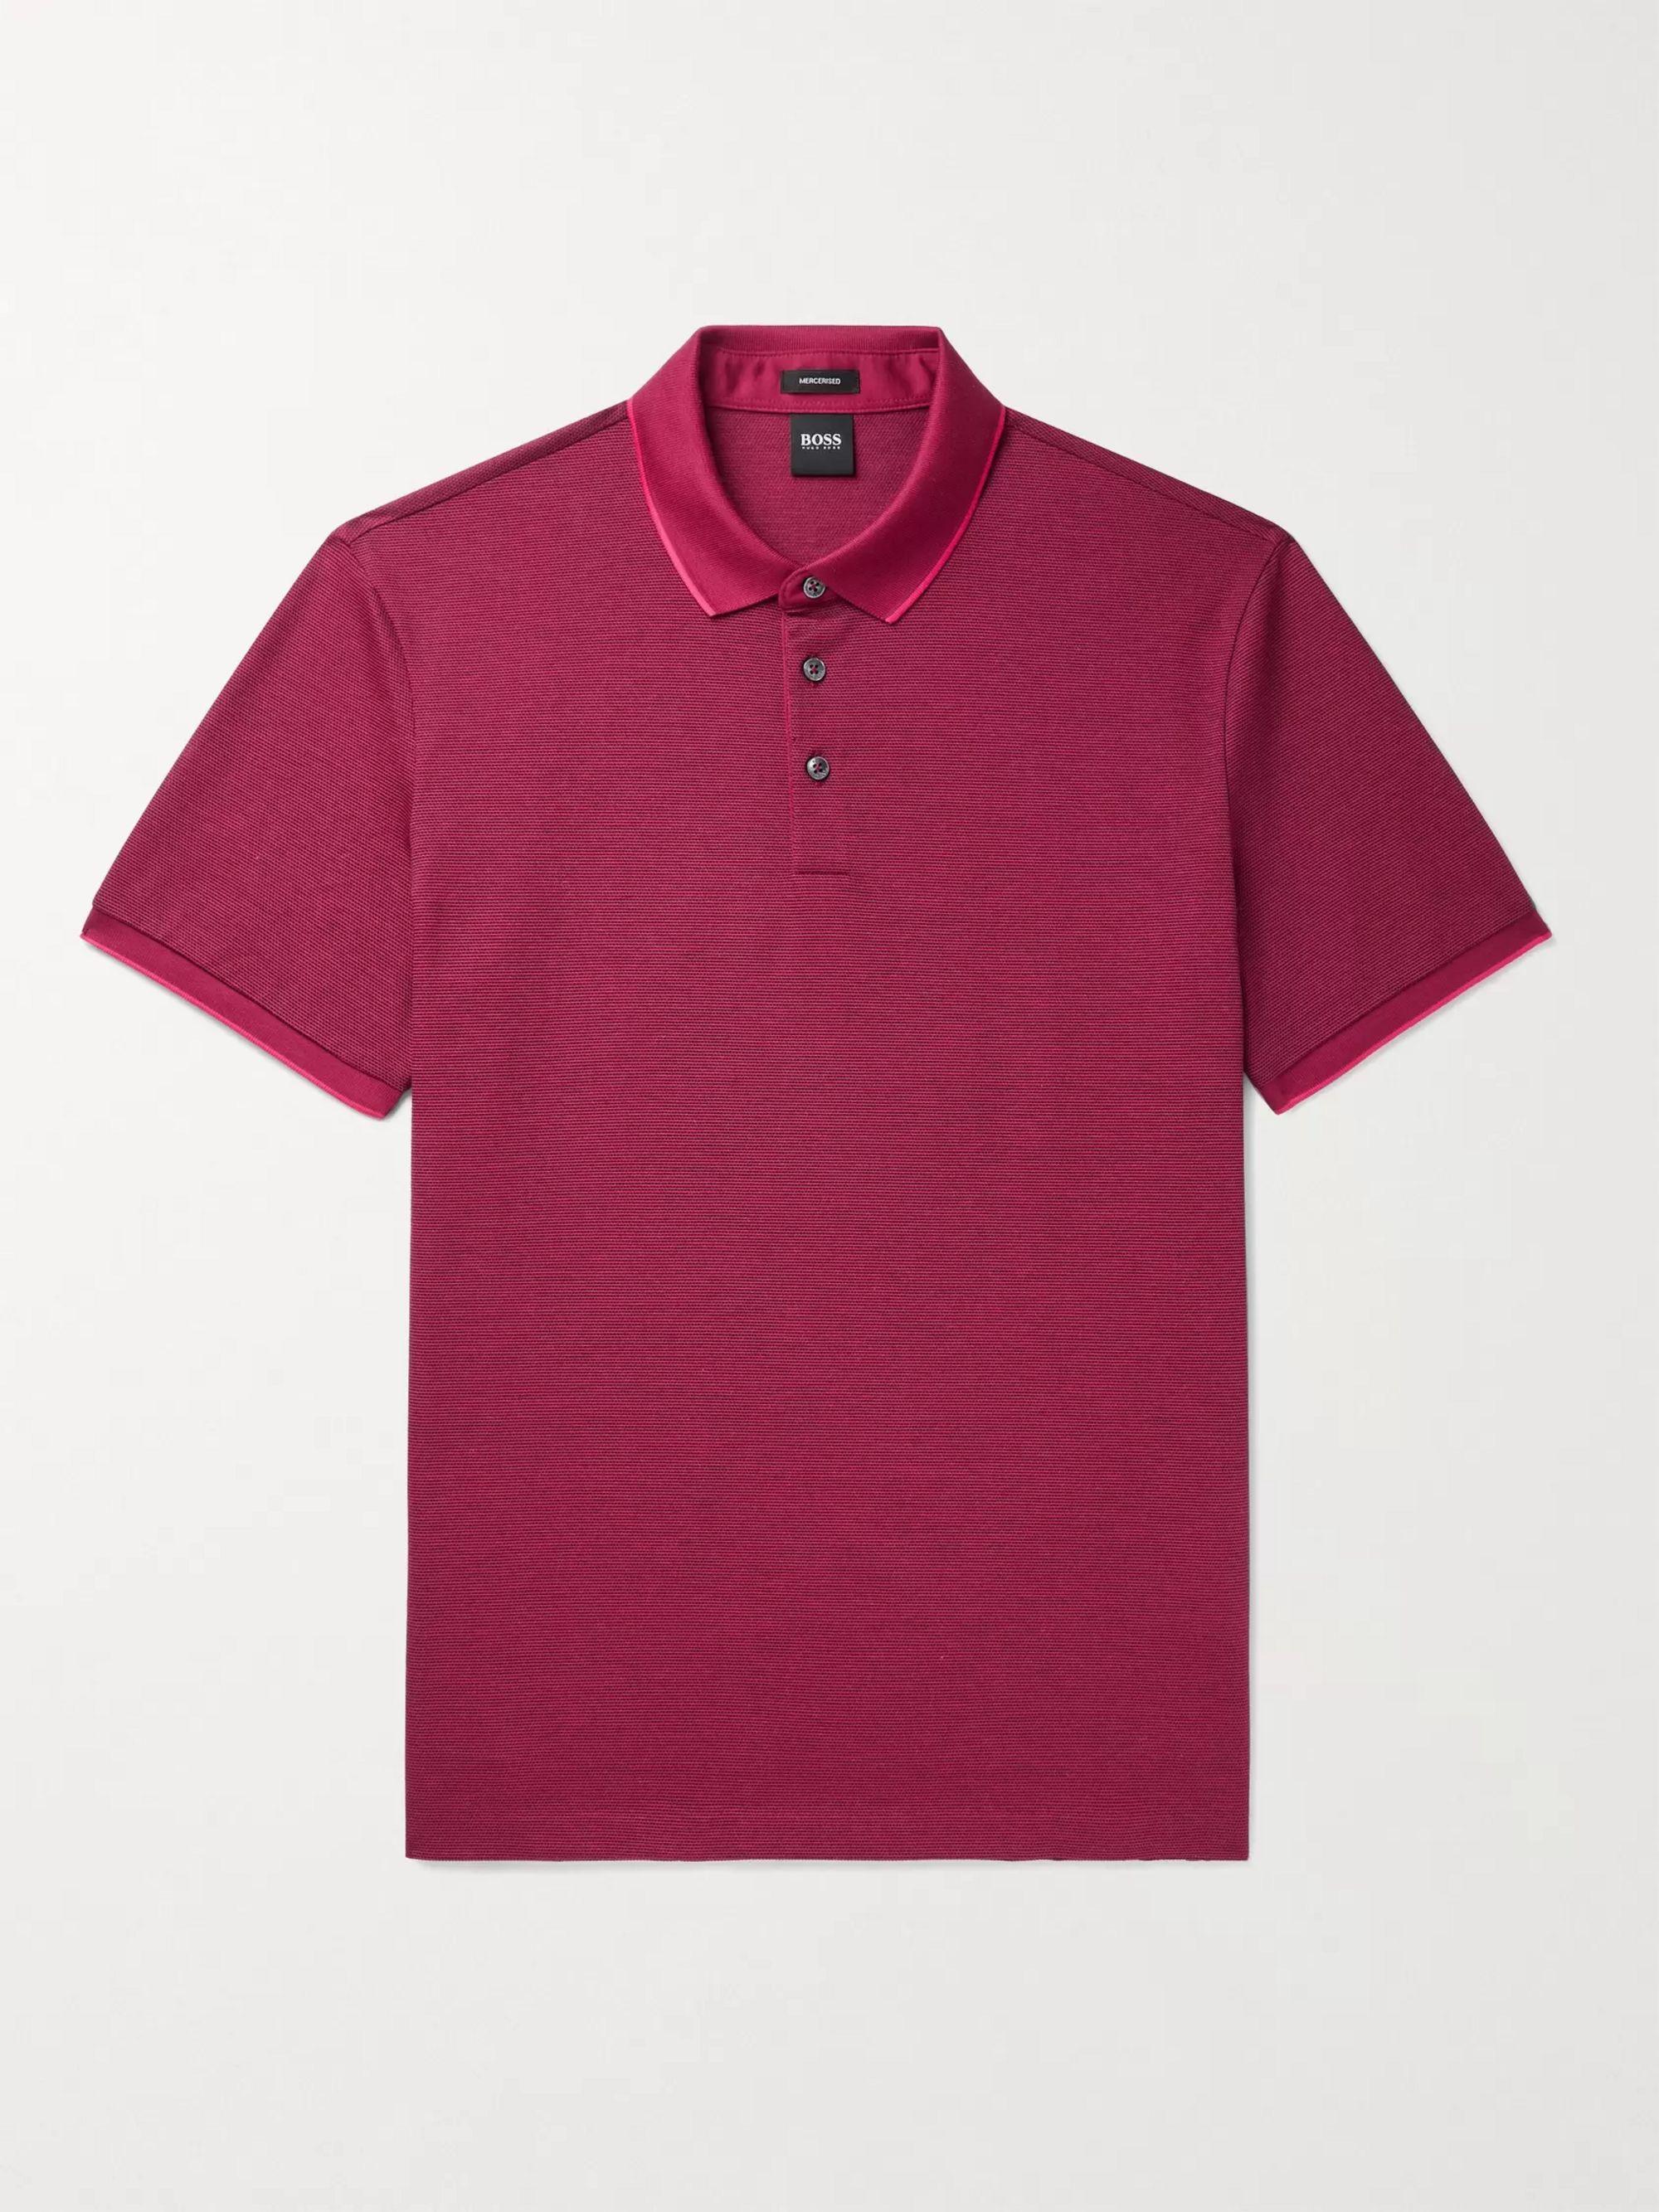 HUGO BOSS Prout Contrast-Tipped Cotton-Pique Polo Shirt